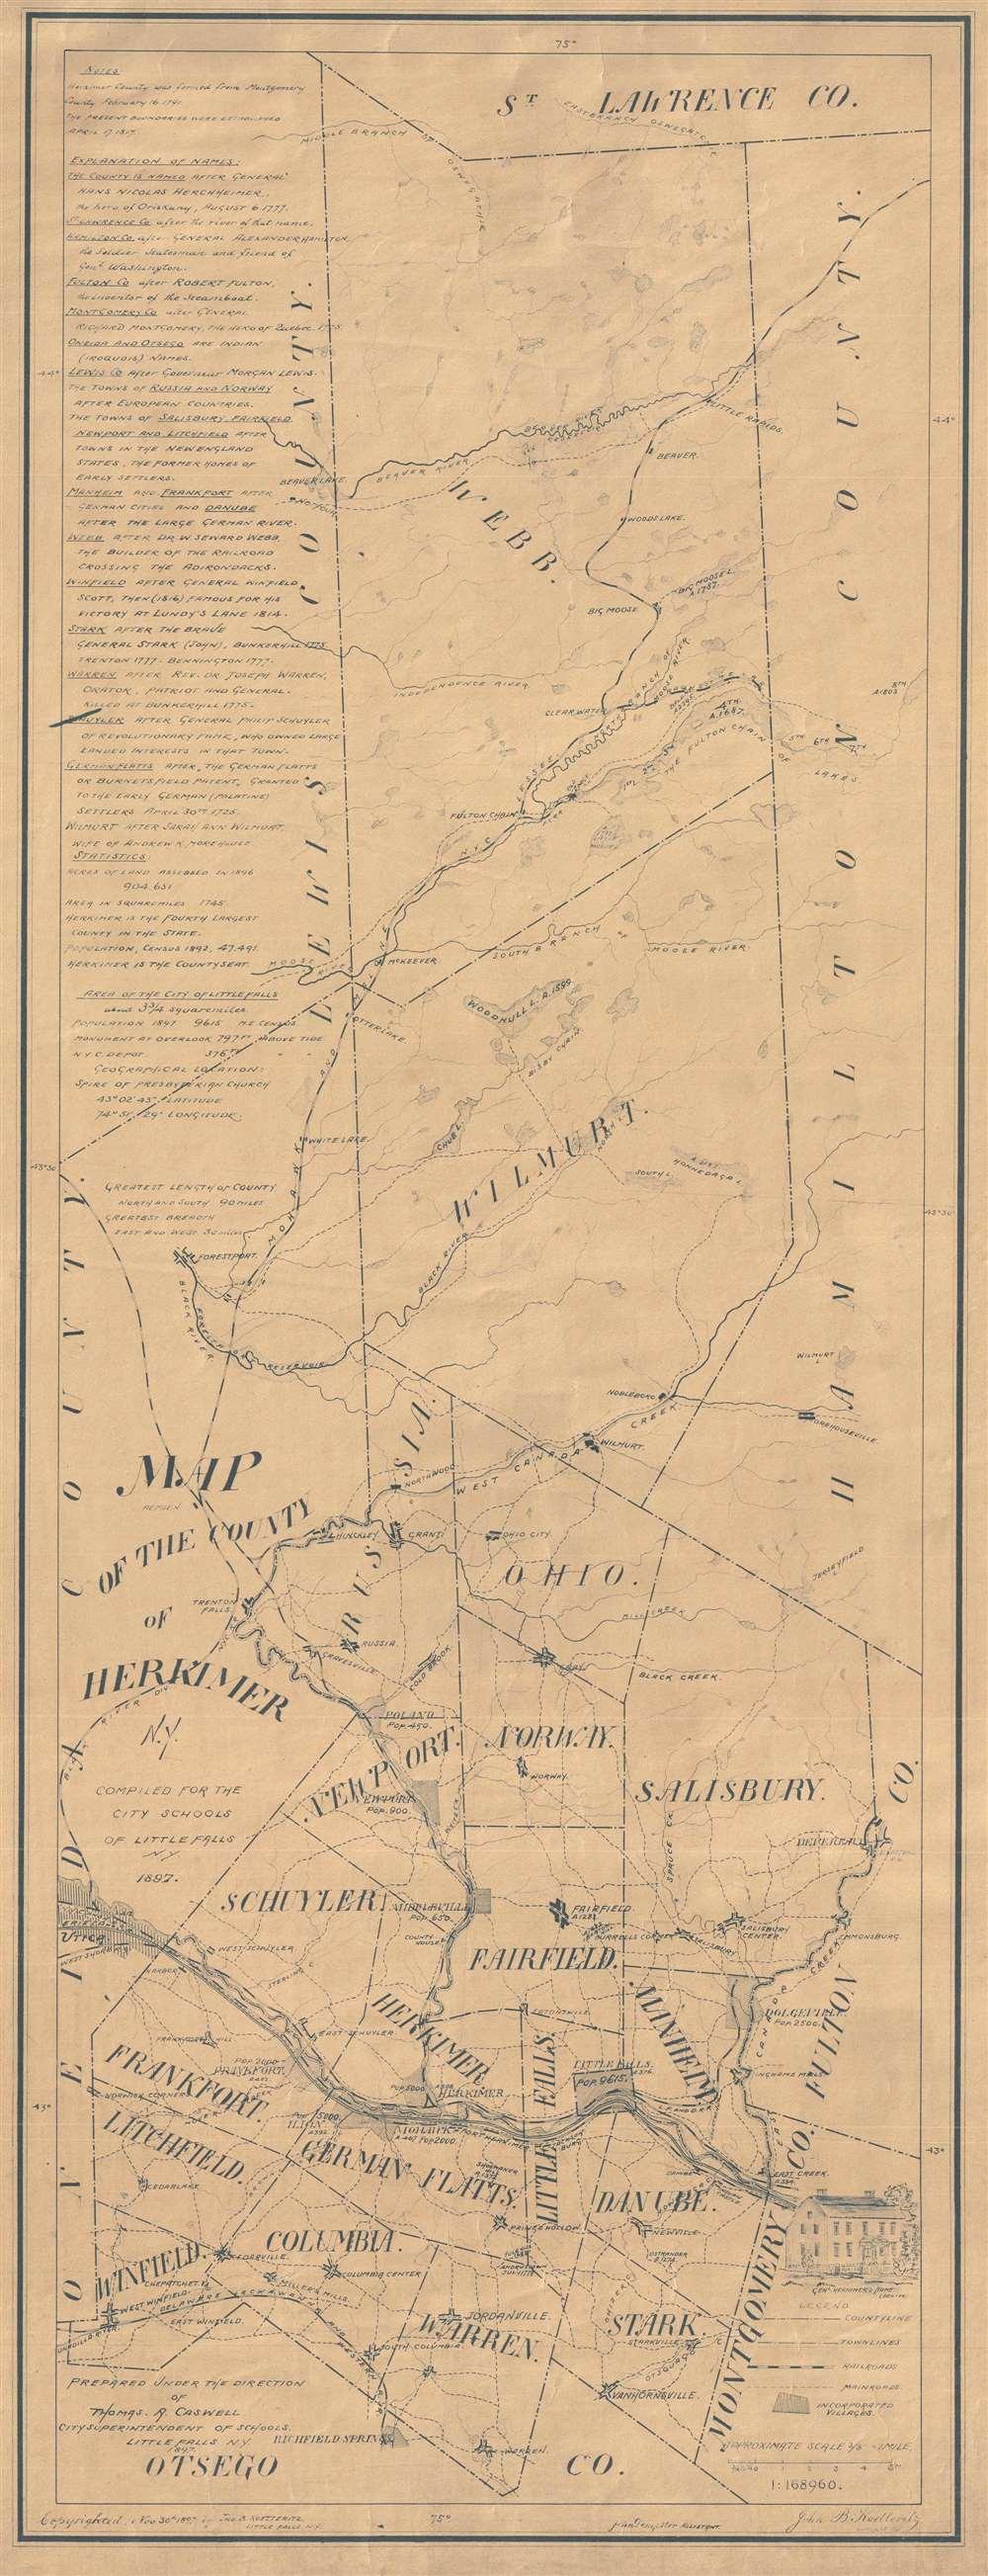 1897 Koetteritz Map of Herkimer County, New York